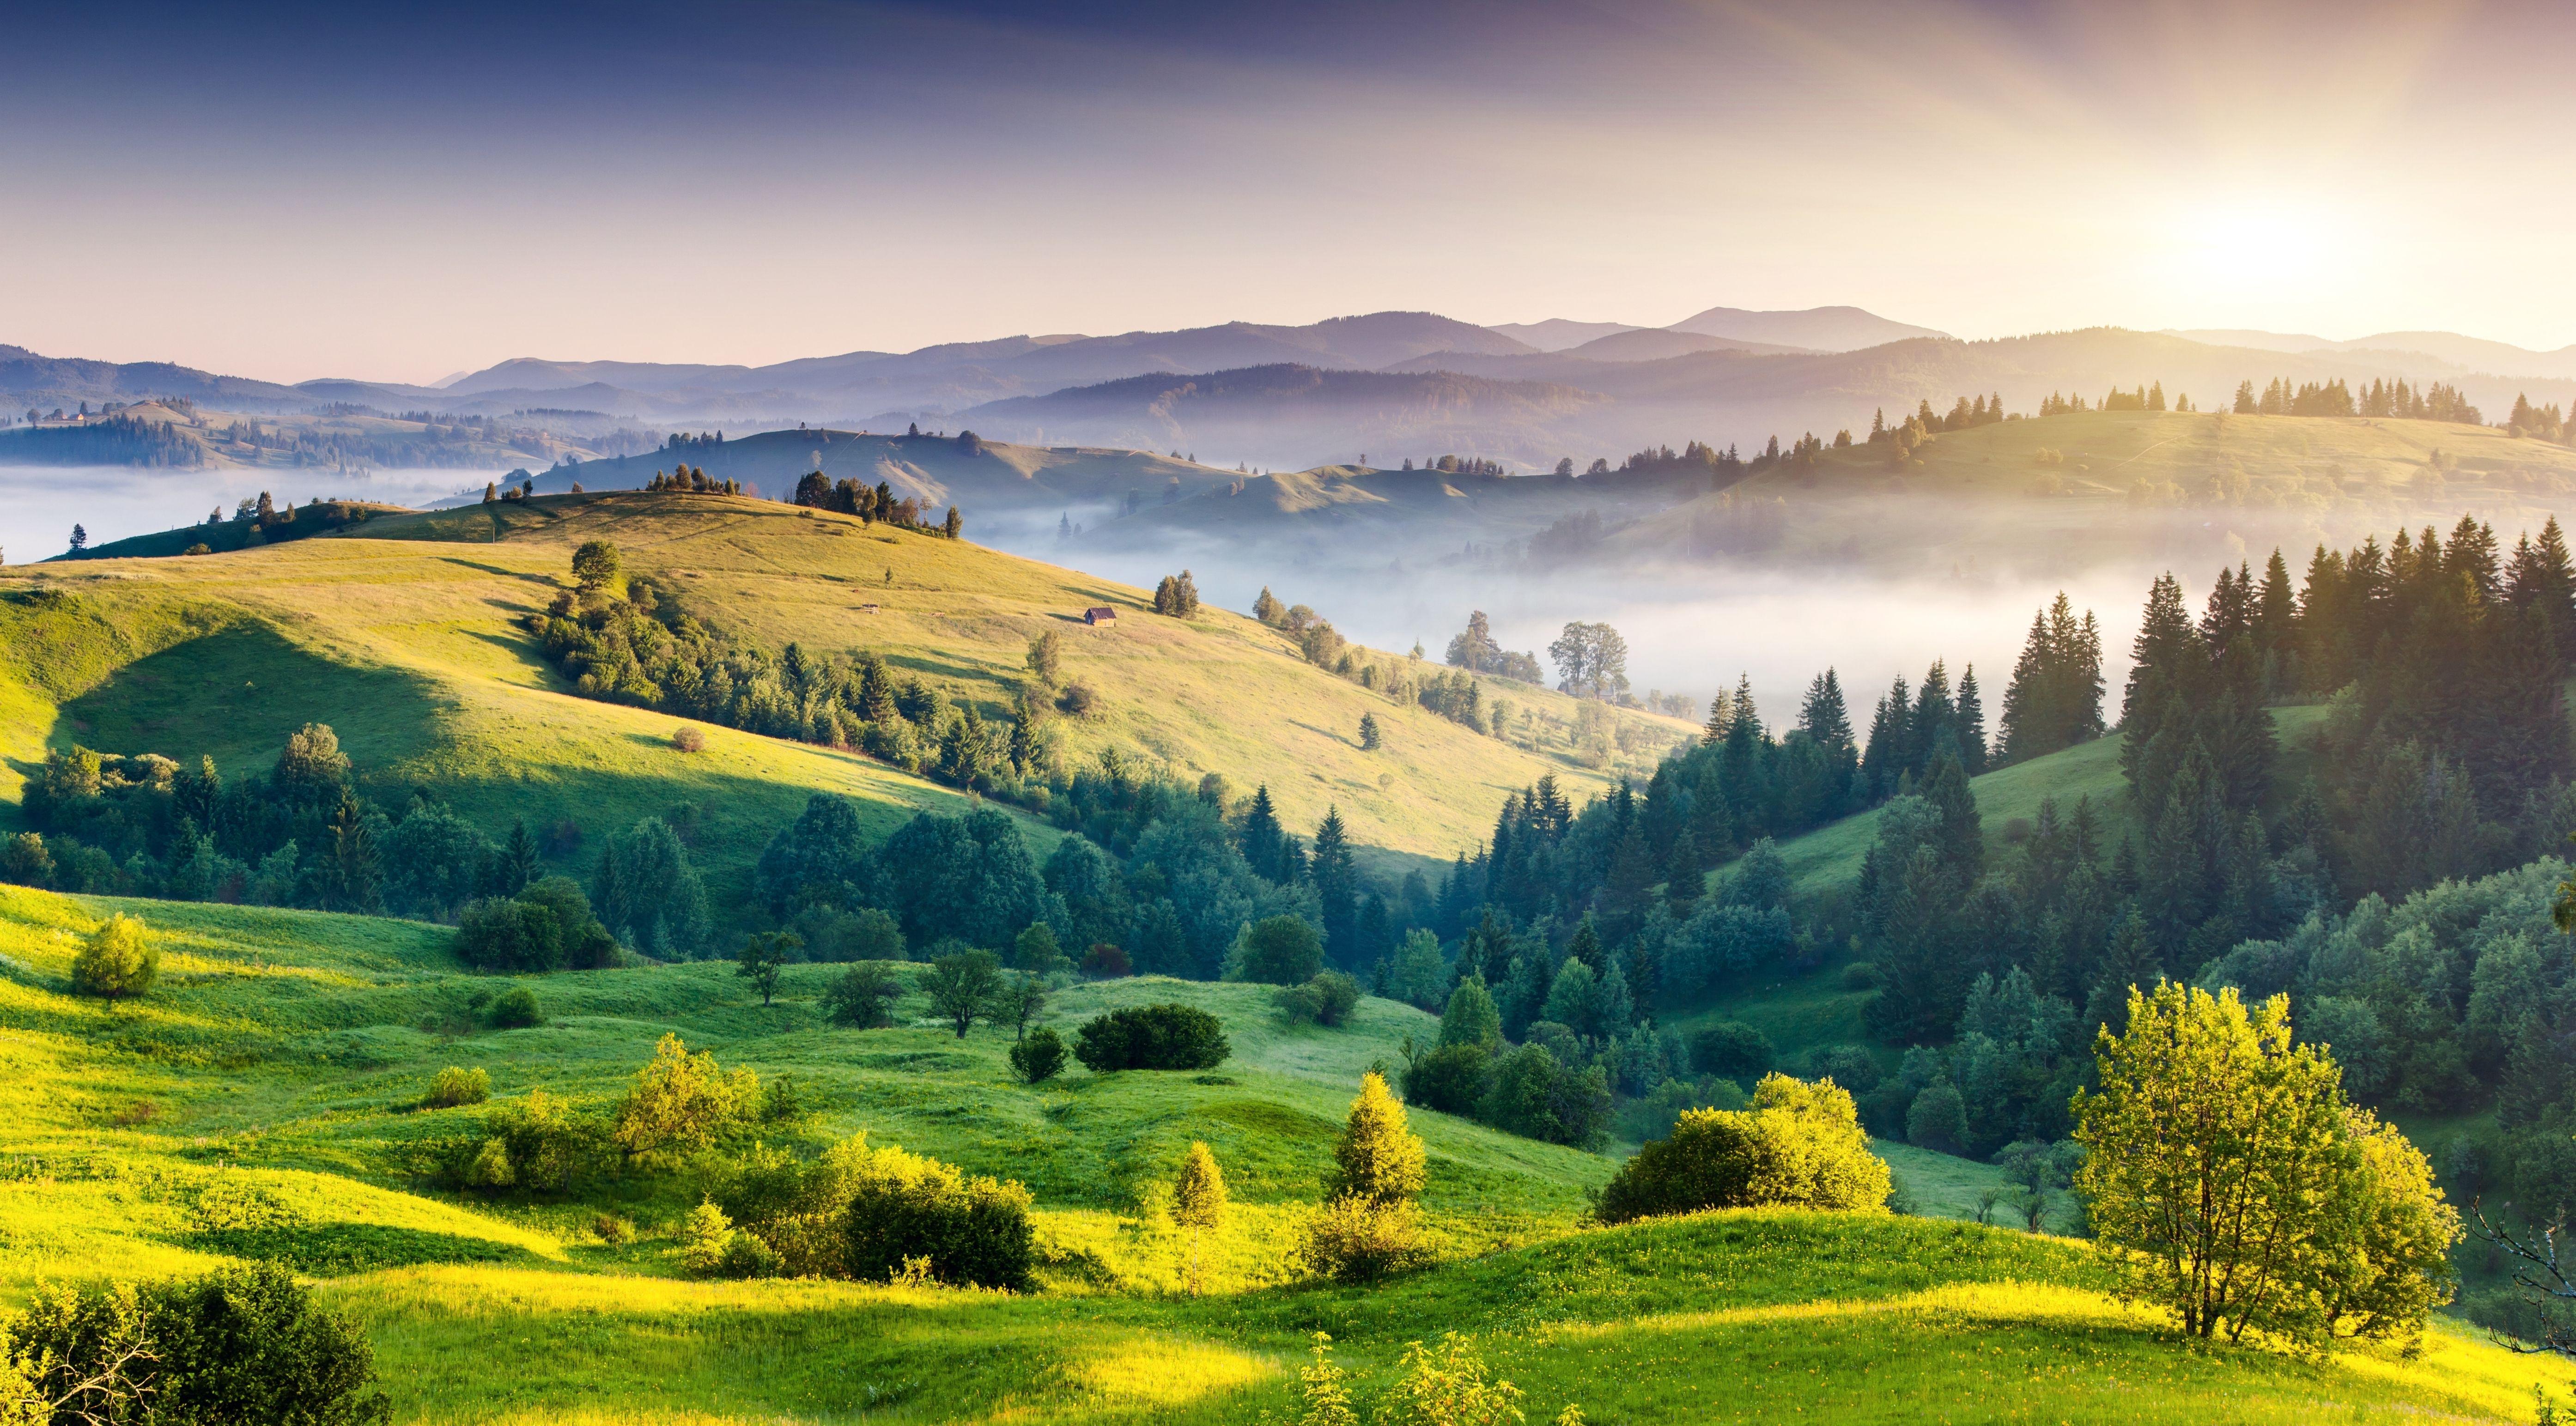 2312 Landscape Hd Wallpapers Backgrounds Wallpaper Abyss Landscape Wallpaper Sunrise Landscape Mountain Landscape